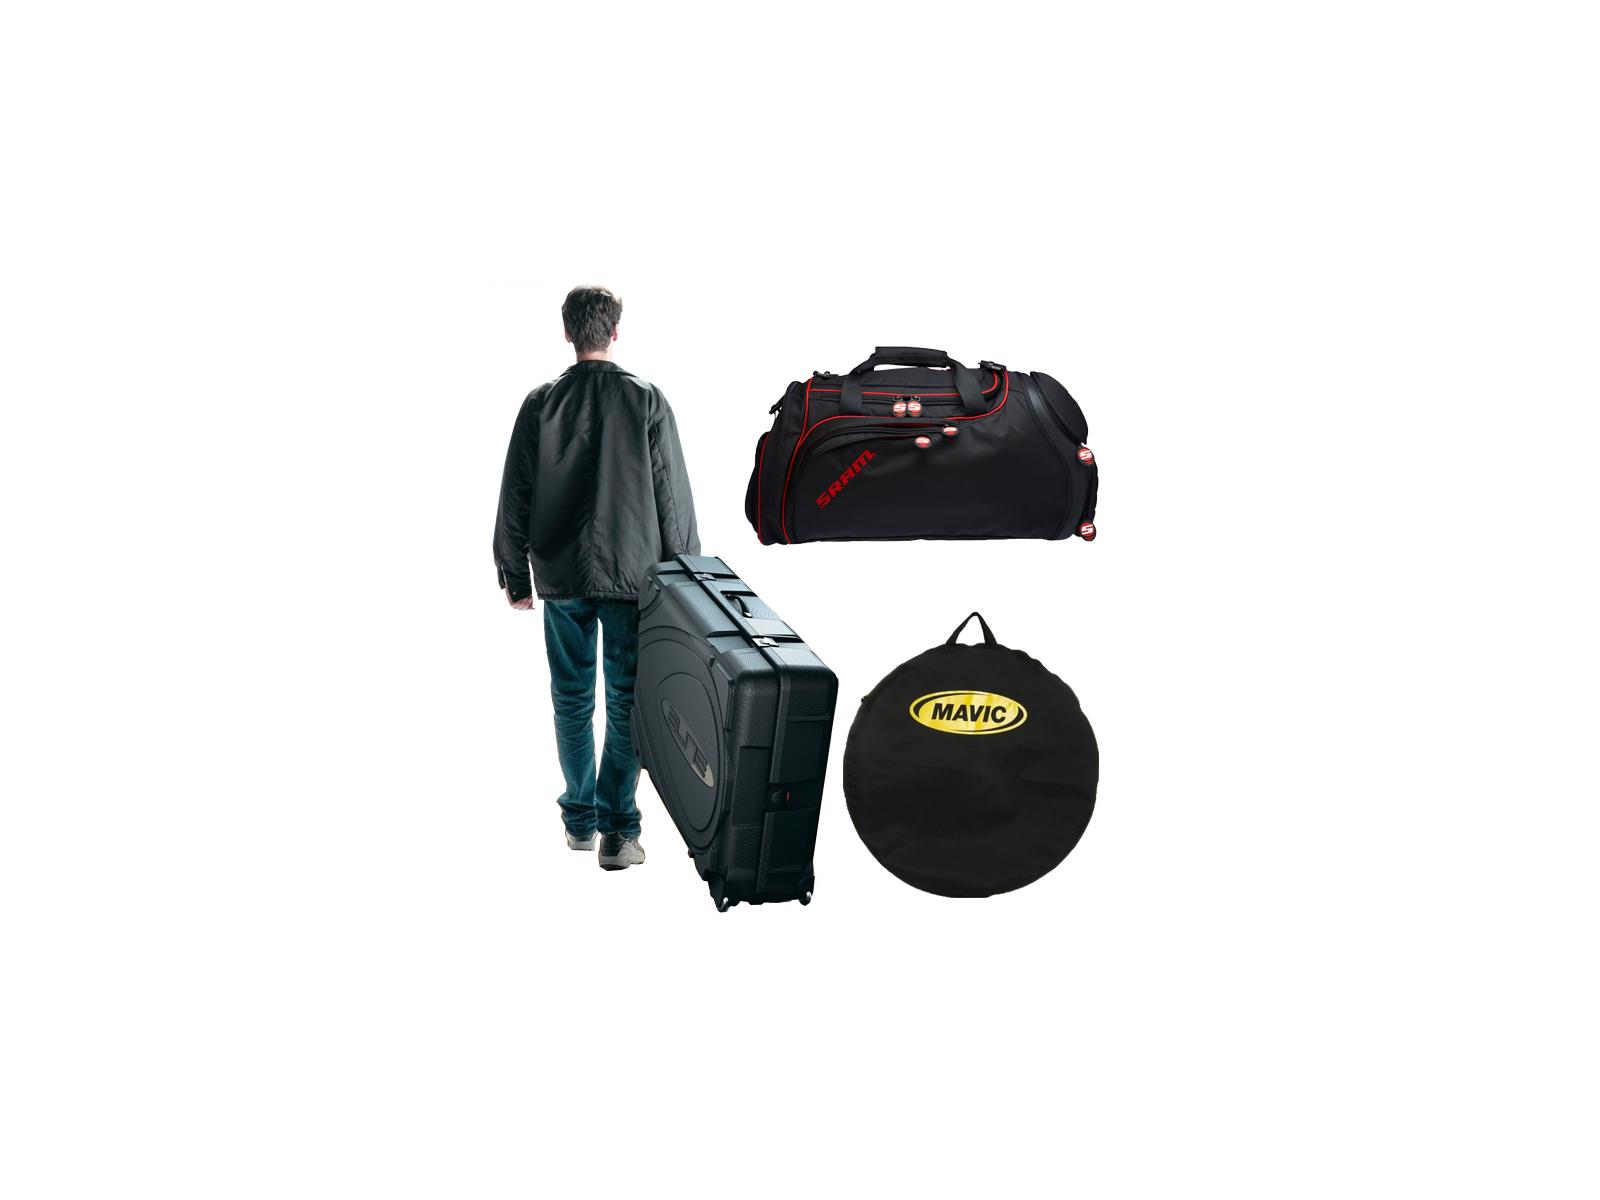 Cykelkuffert, transport- og hjultasker